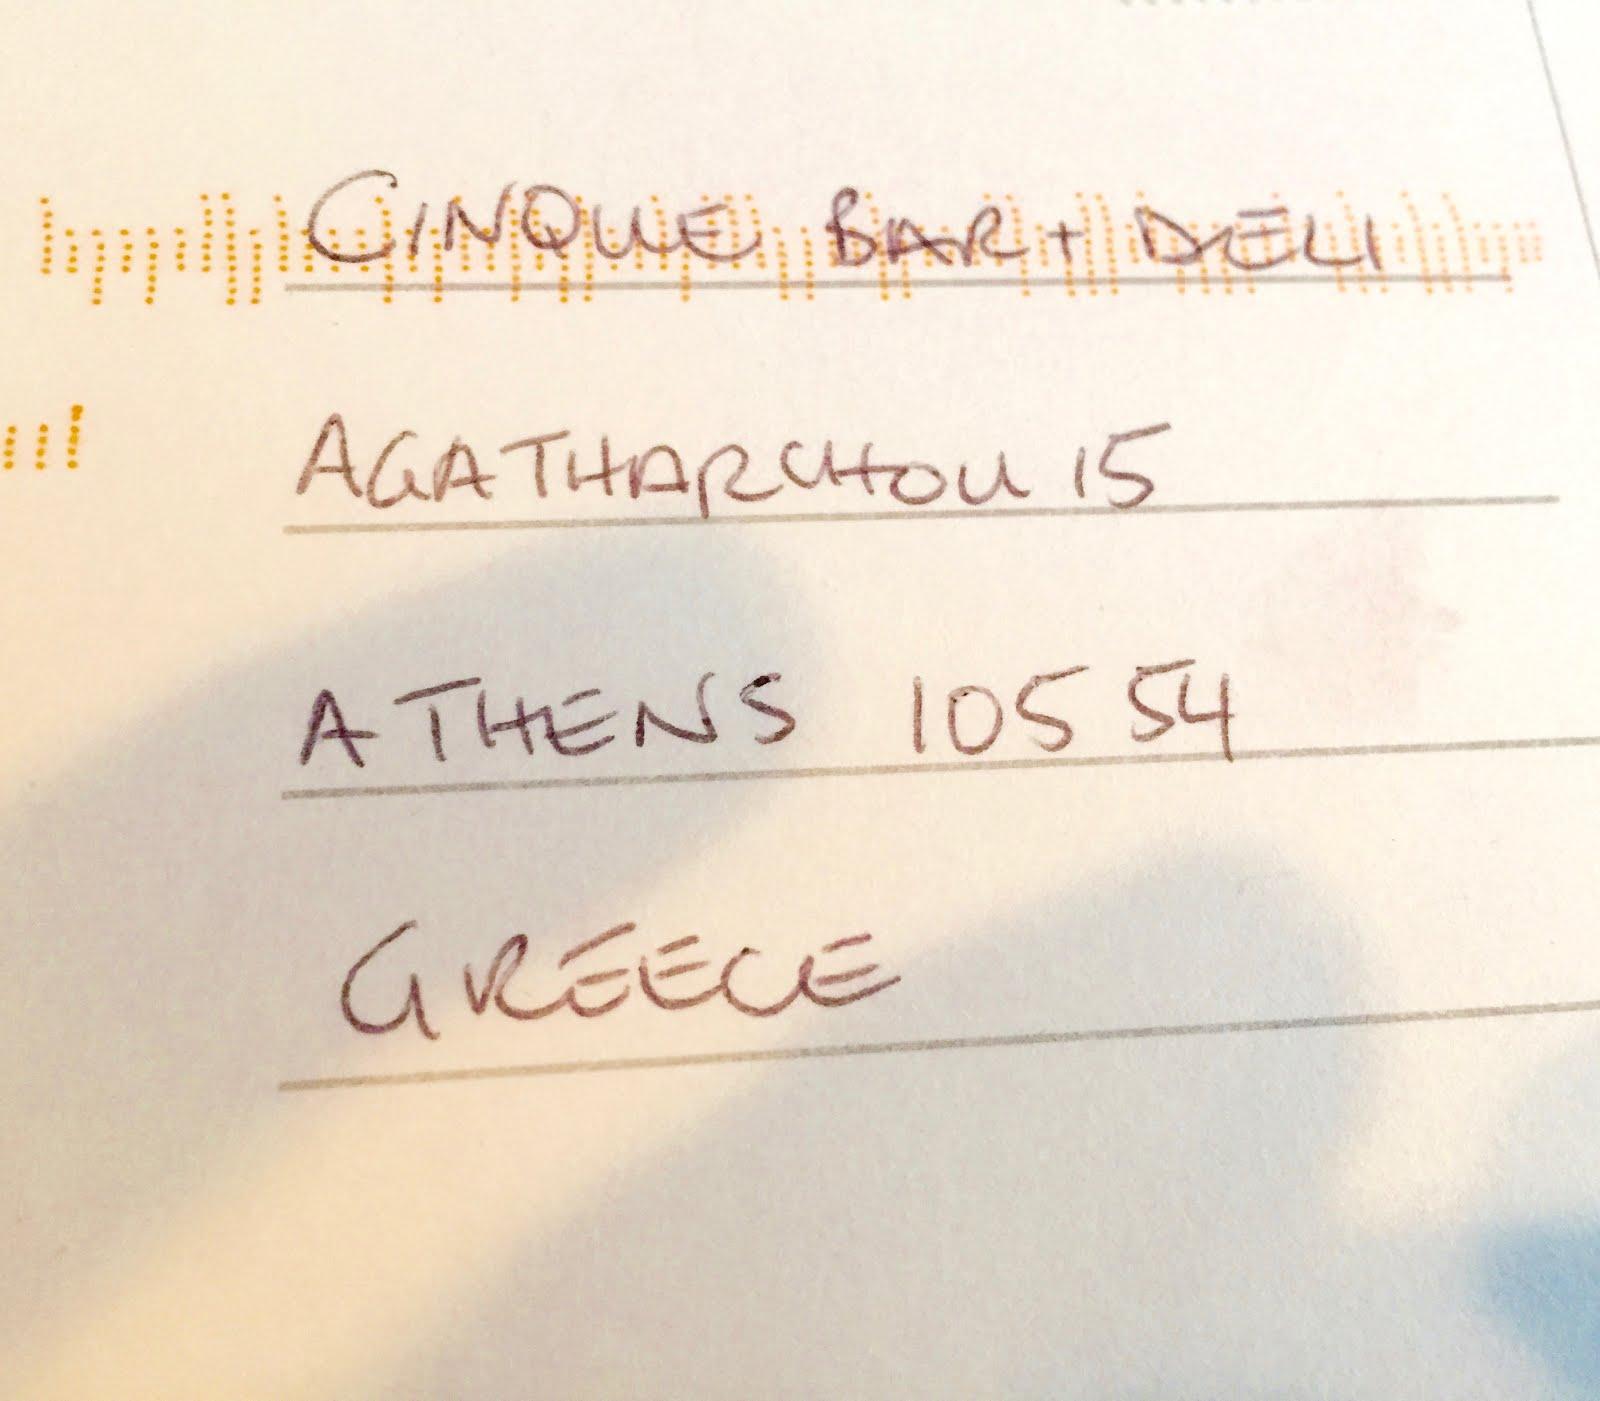 Sending love to the Cinque Wine Bar, Athens, Greece | spaswinefood